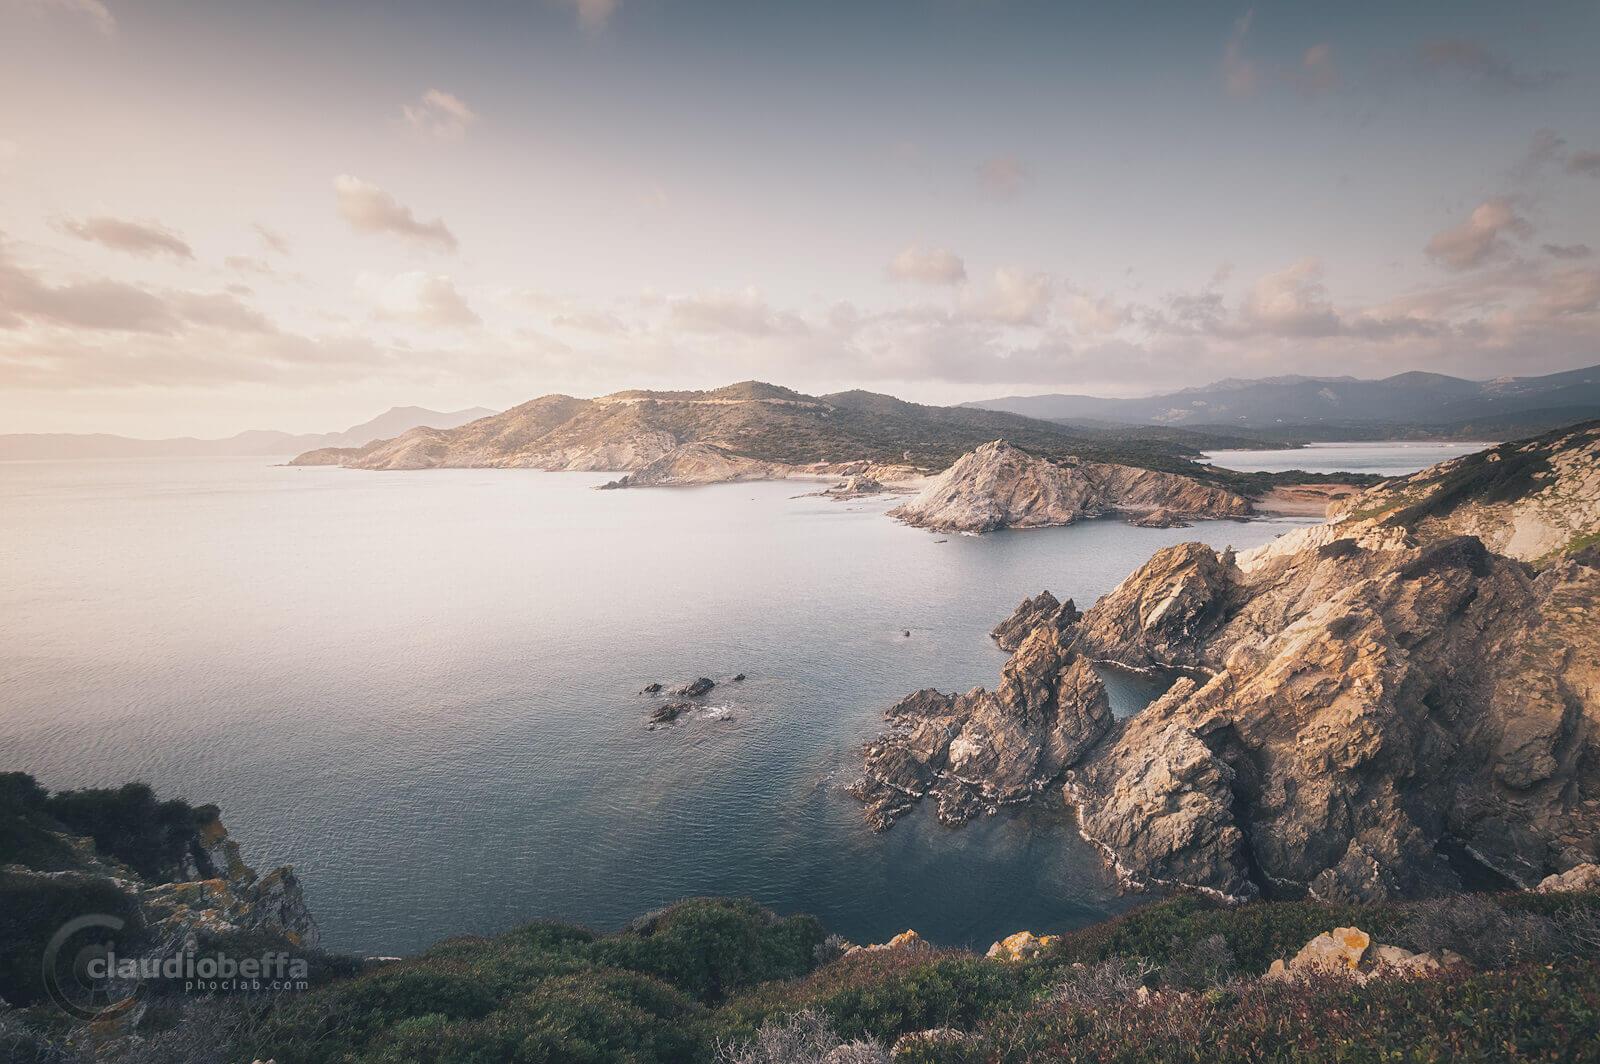 High nest, Sardinia, Sardegna, Italy, Sea, Seascape, Landscape, Sunset, Nature, Light, Rocks, Promontory, Coastline